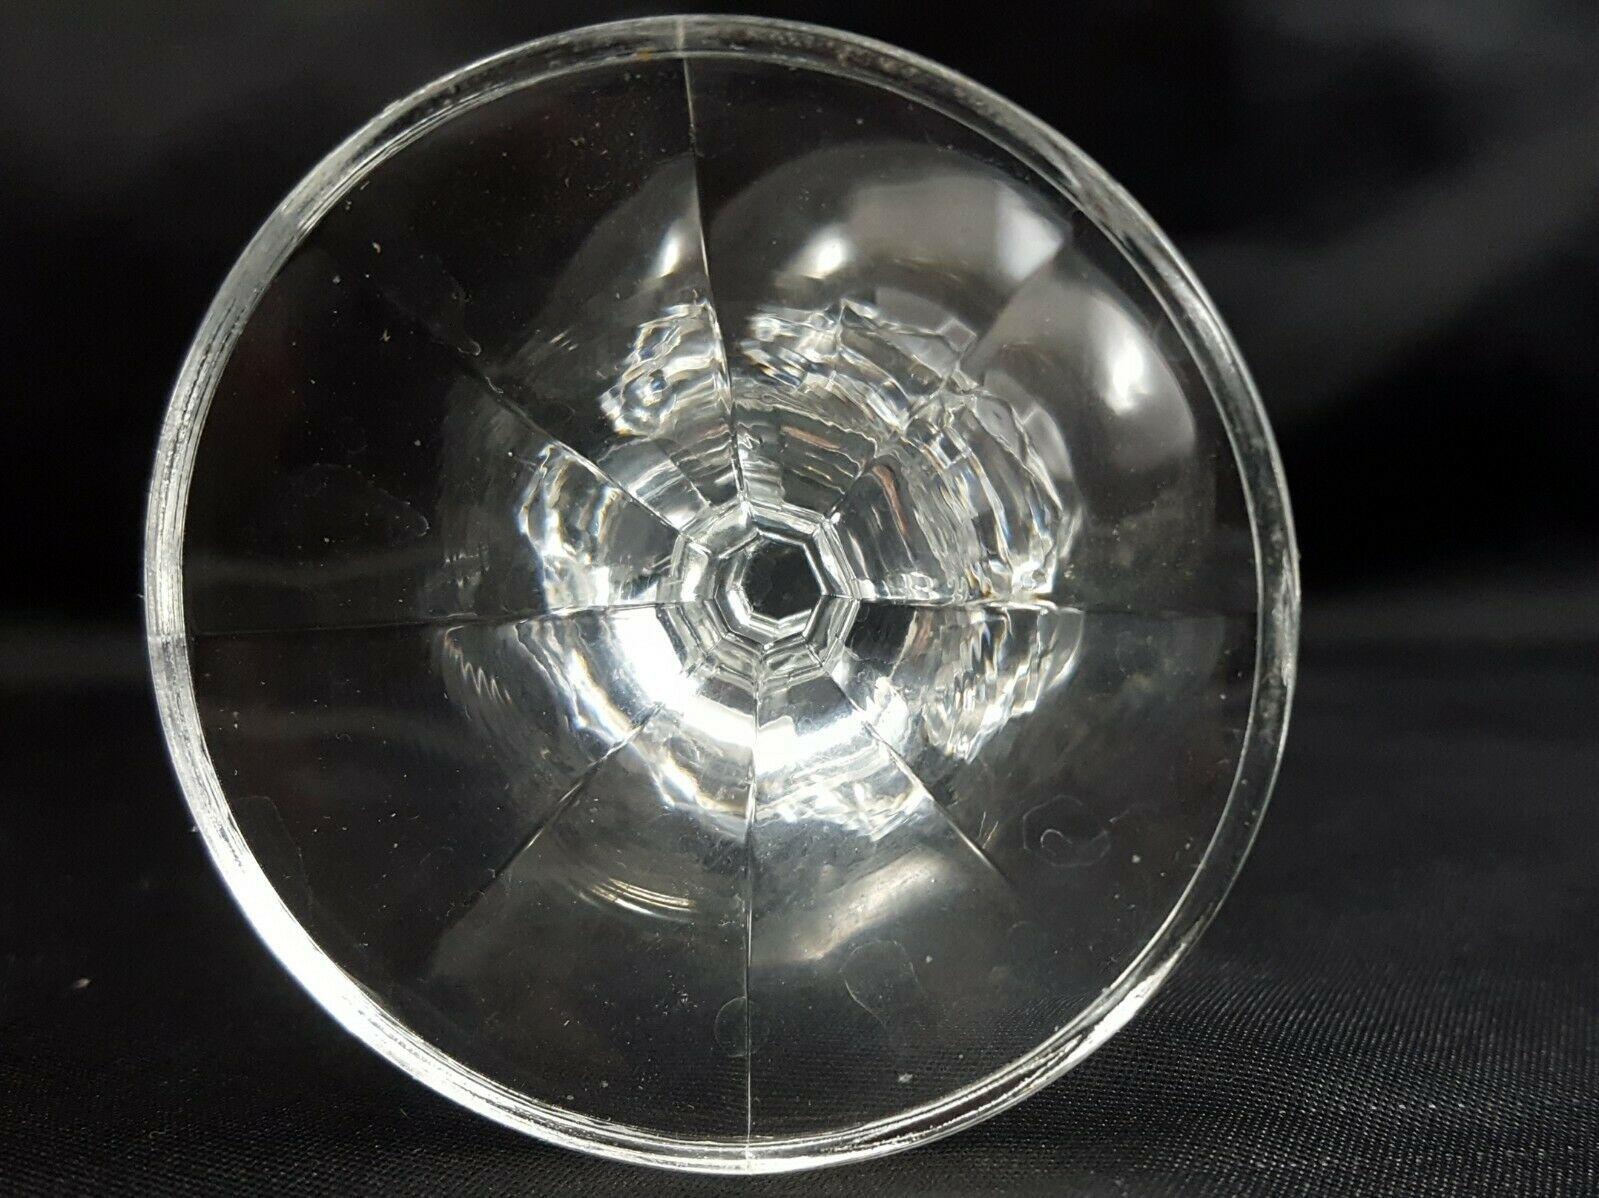 Crystalex Import Assoc Cascade Champagne Flutes Set of 2 Czech Crystal 6 oz image 5